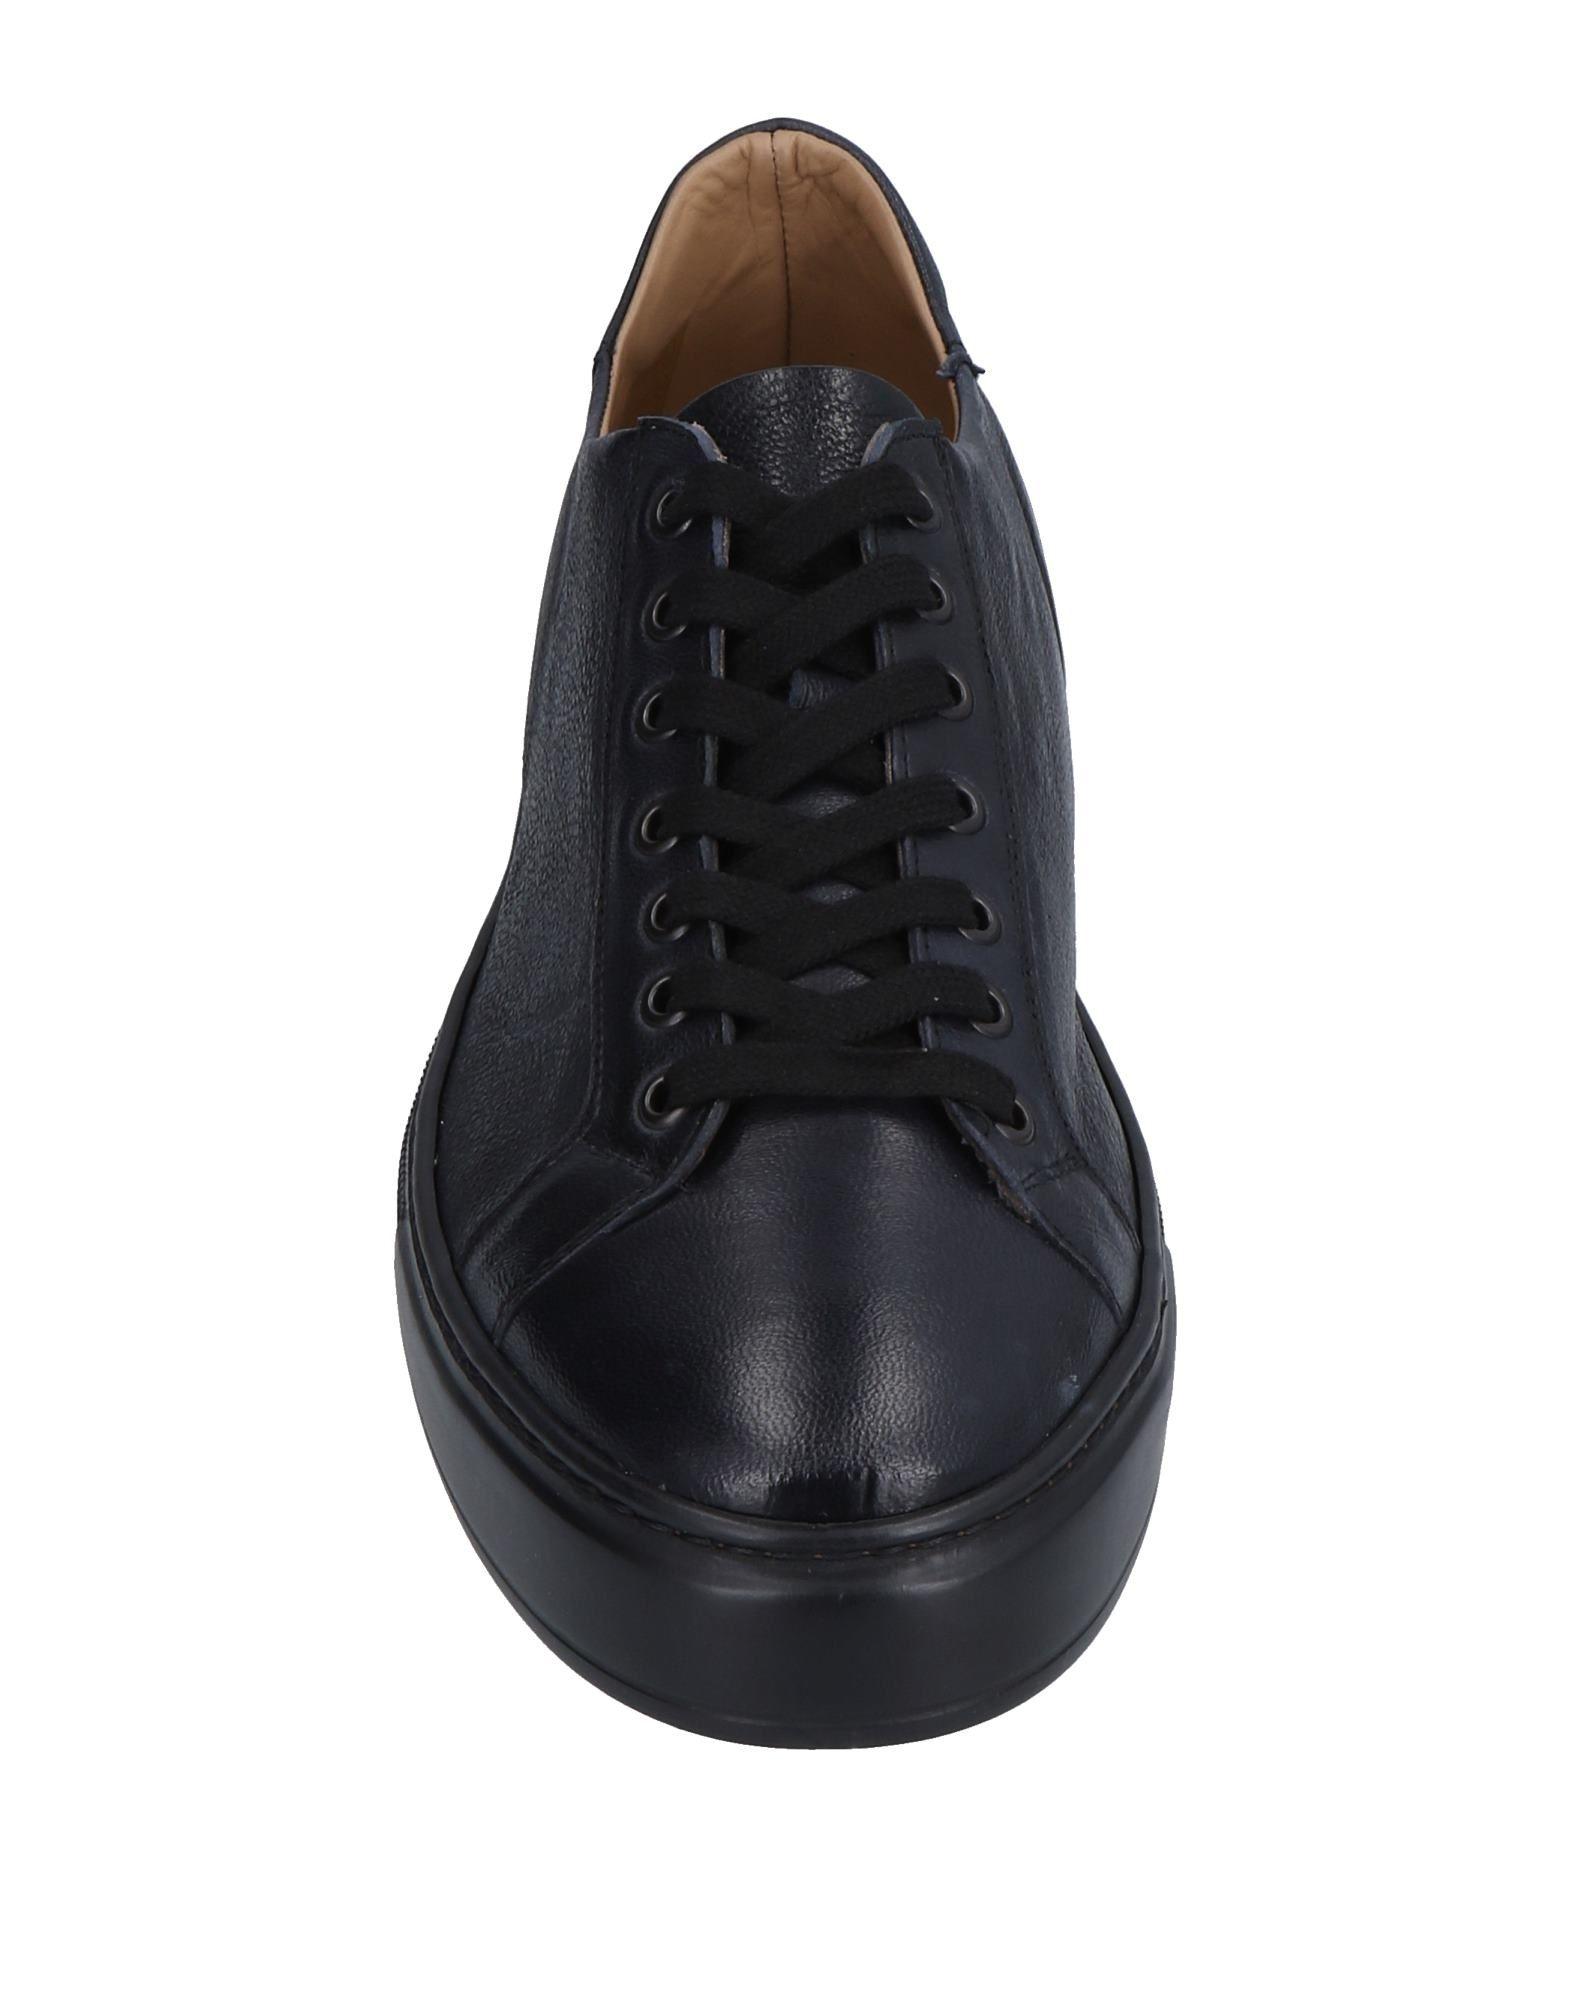 ... Rabatt Herren echte Schuhe Bagatt Sneakers Herren Rabatt 11518260QK  3ebf93 ... 871a54a166